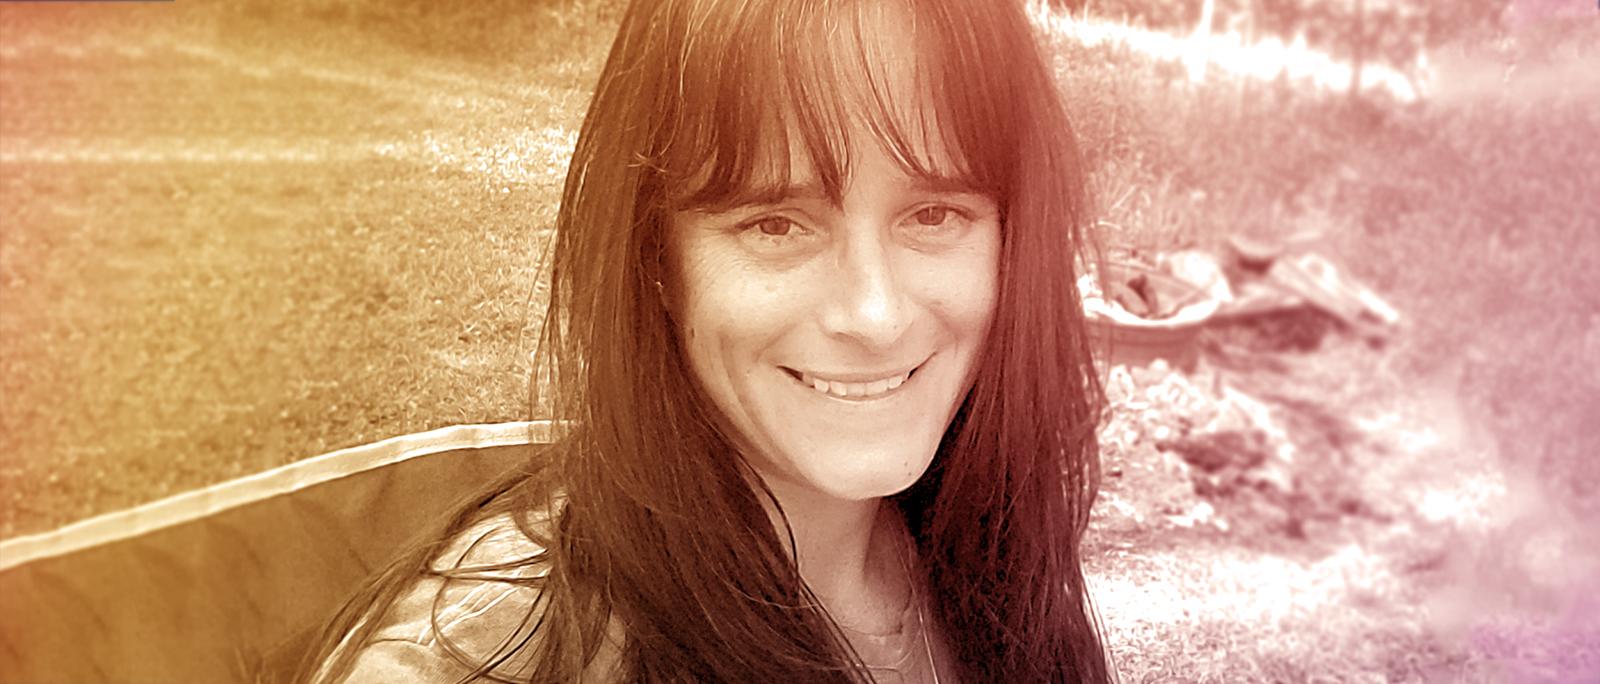 Get to Know: Jenn Layport